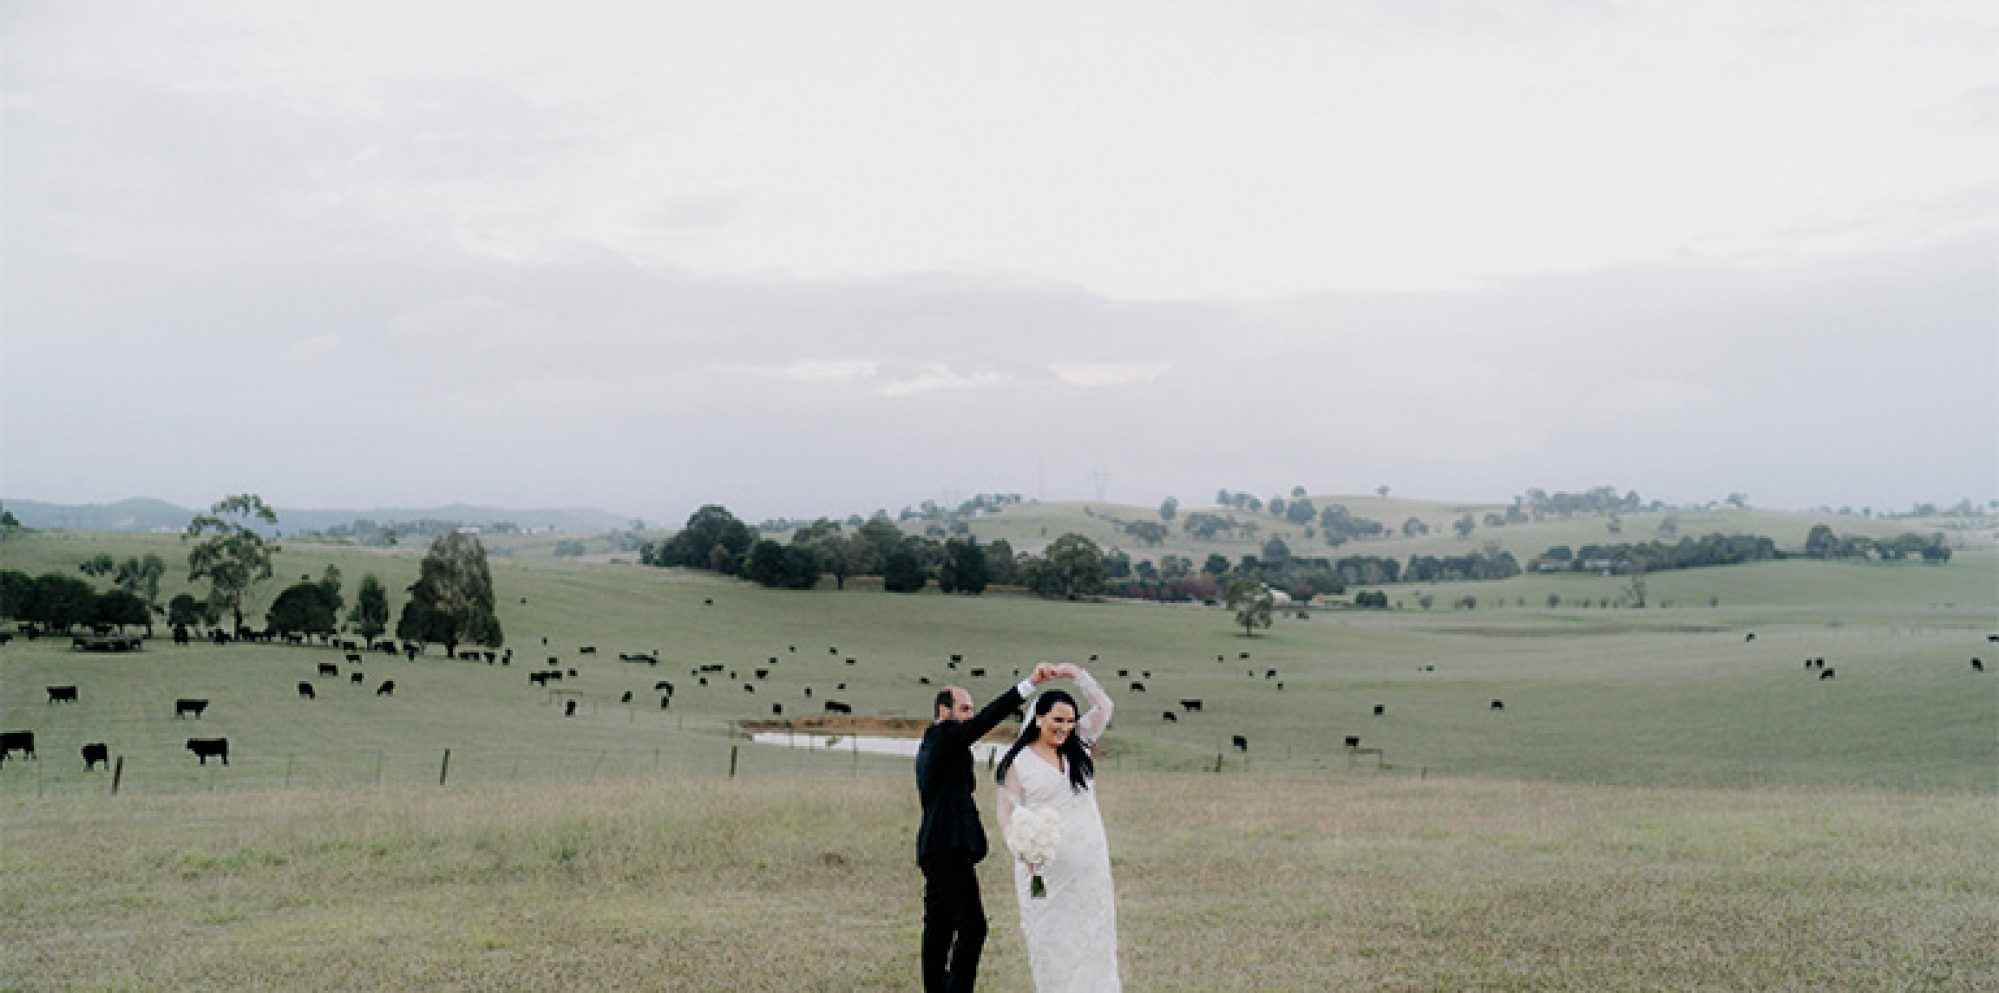 Enza & salvatore wedding photography @ vue on halcyon